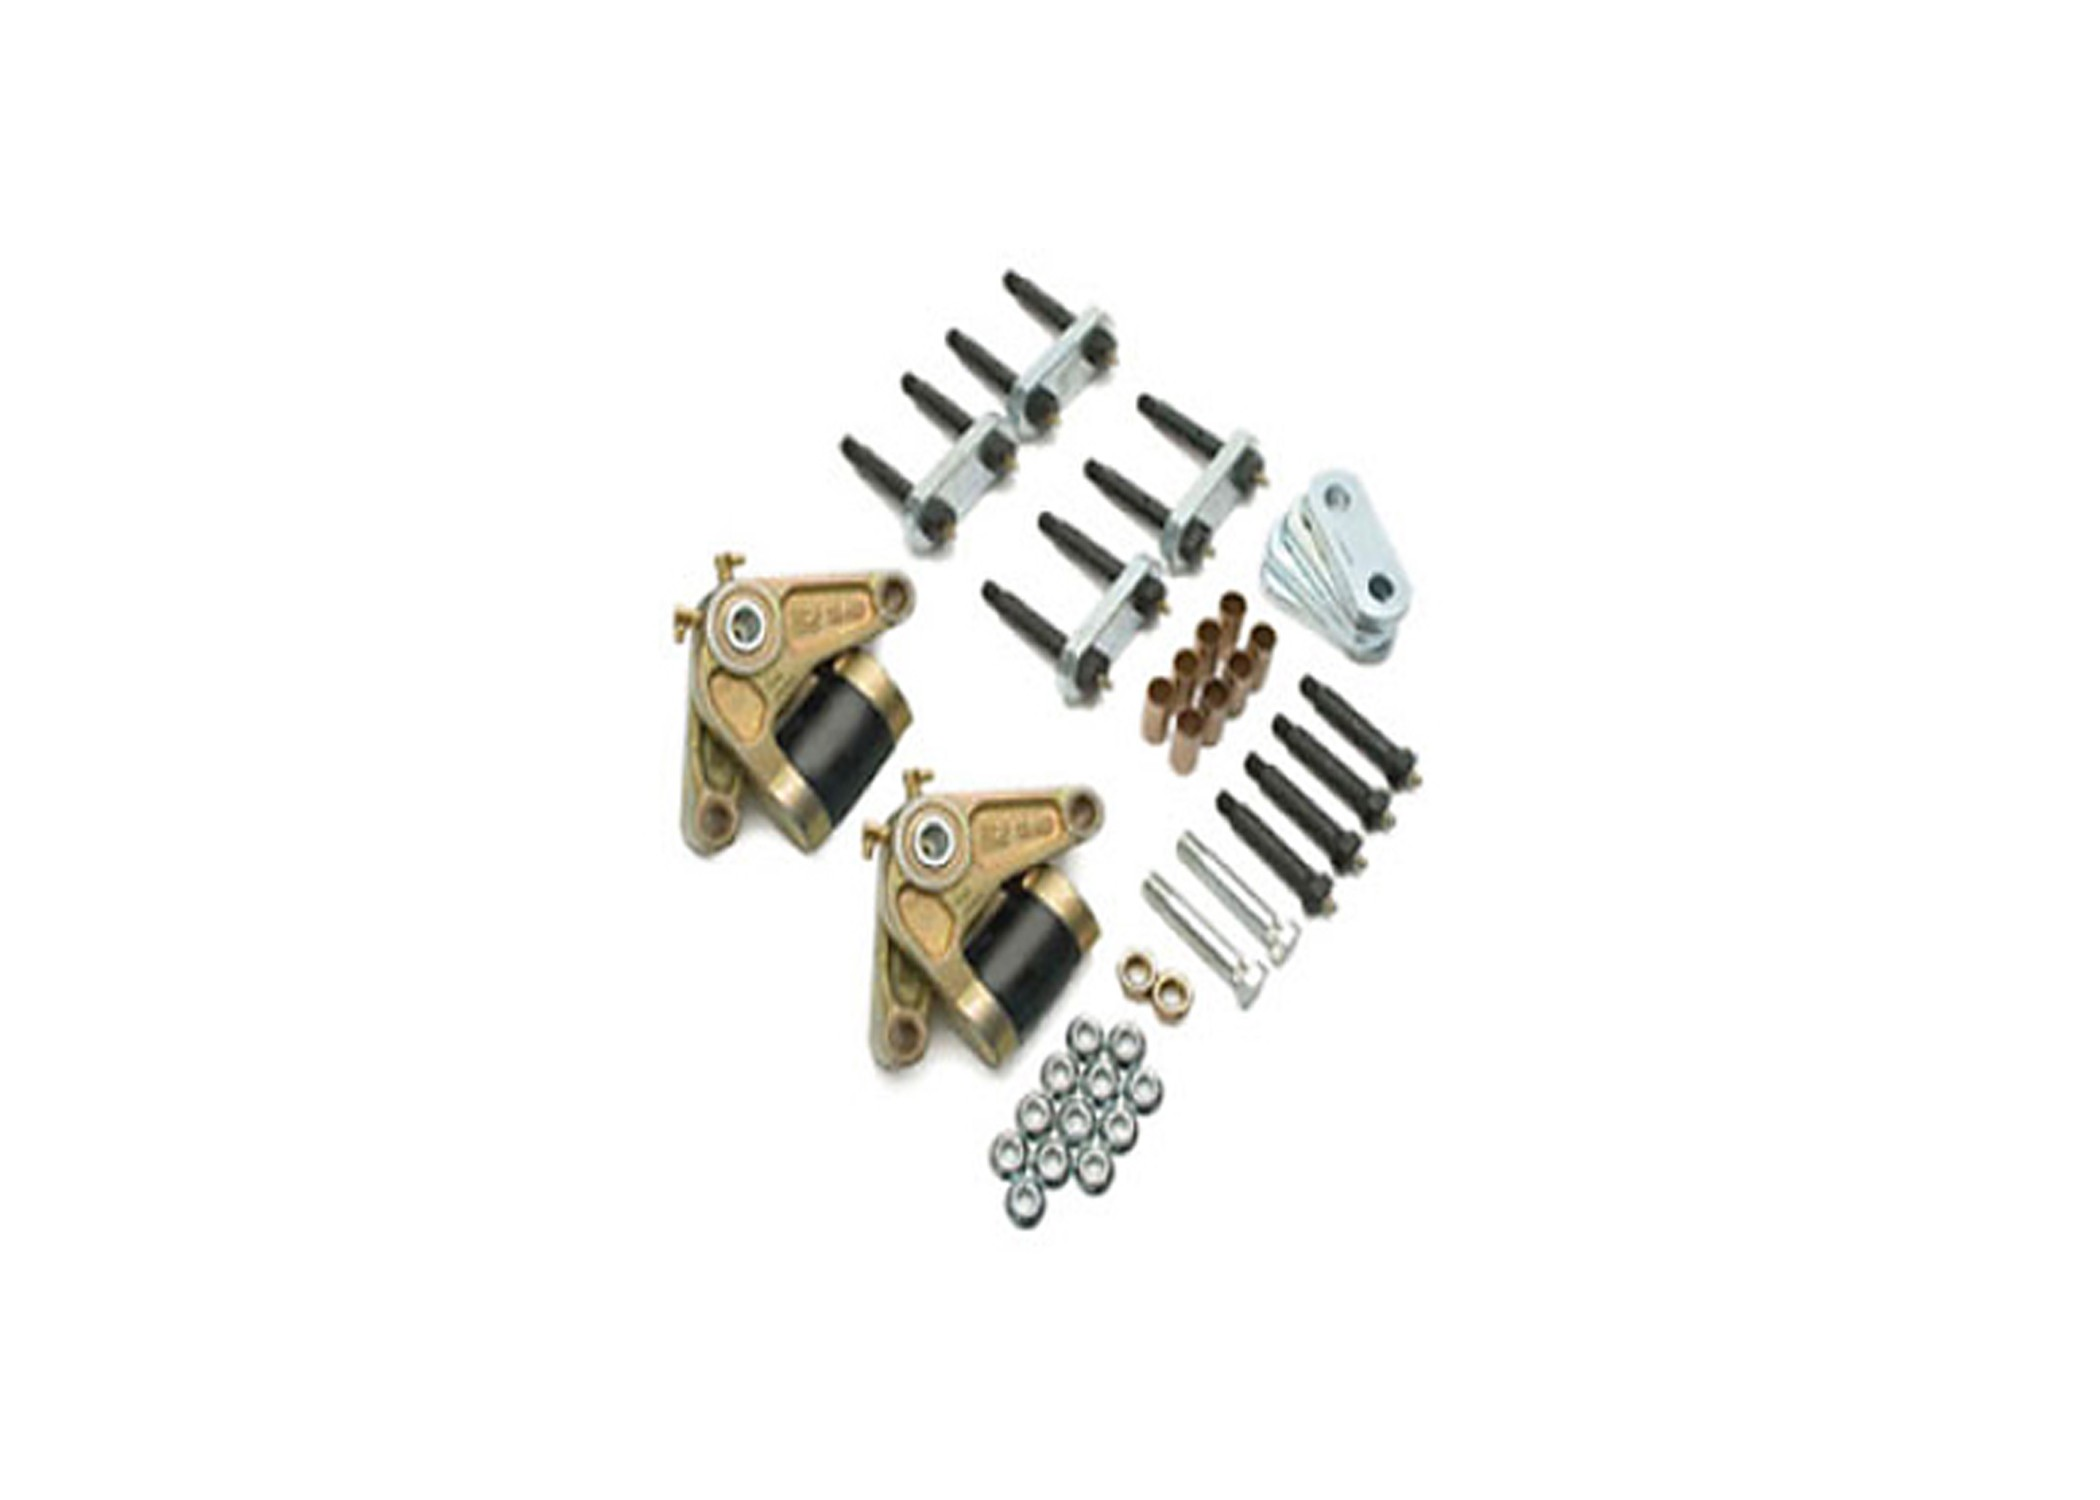 e-z flex suspension kit tandem axle